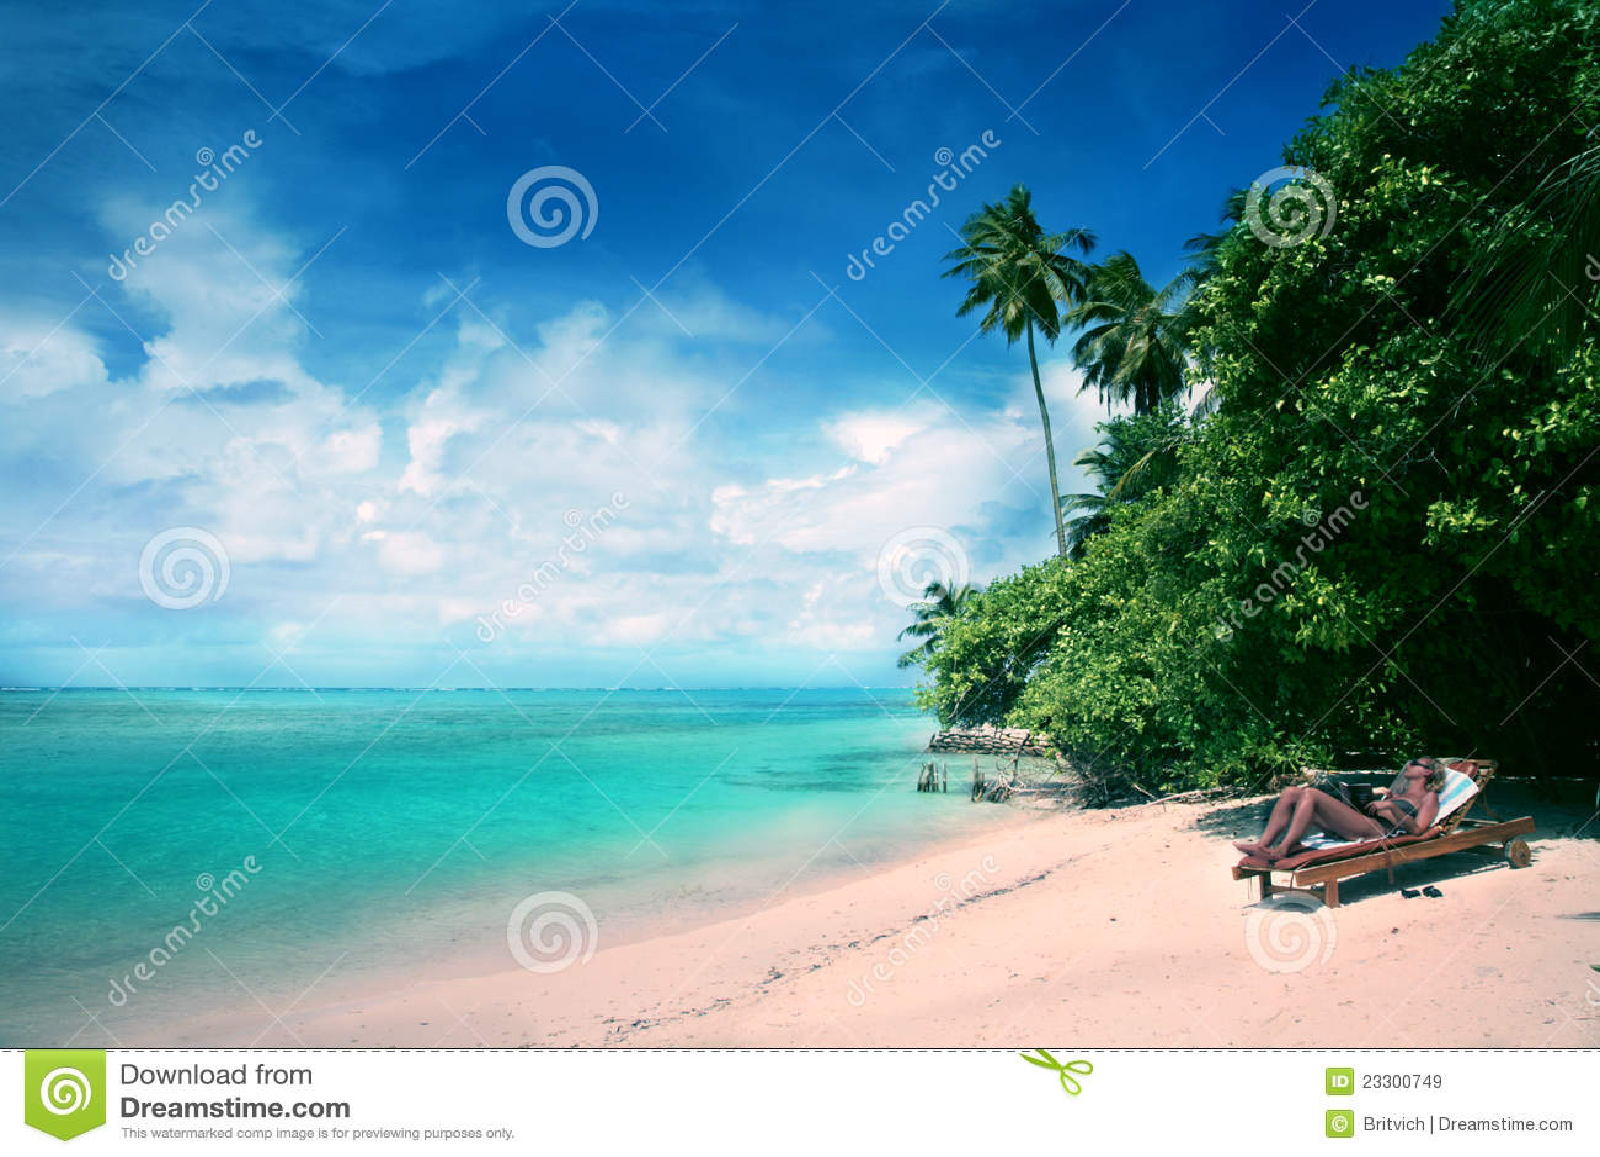 Maldives resort Medufushi